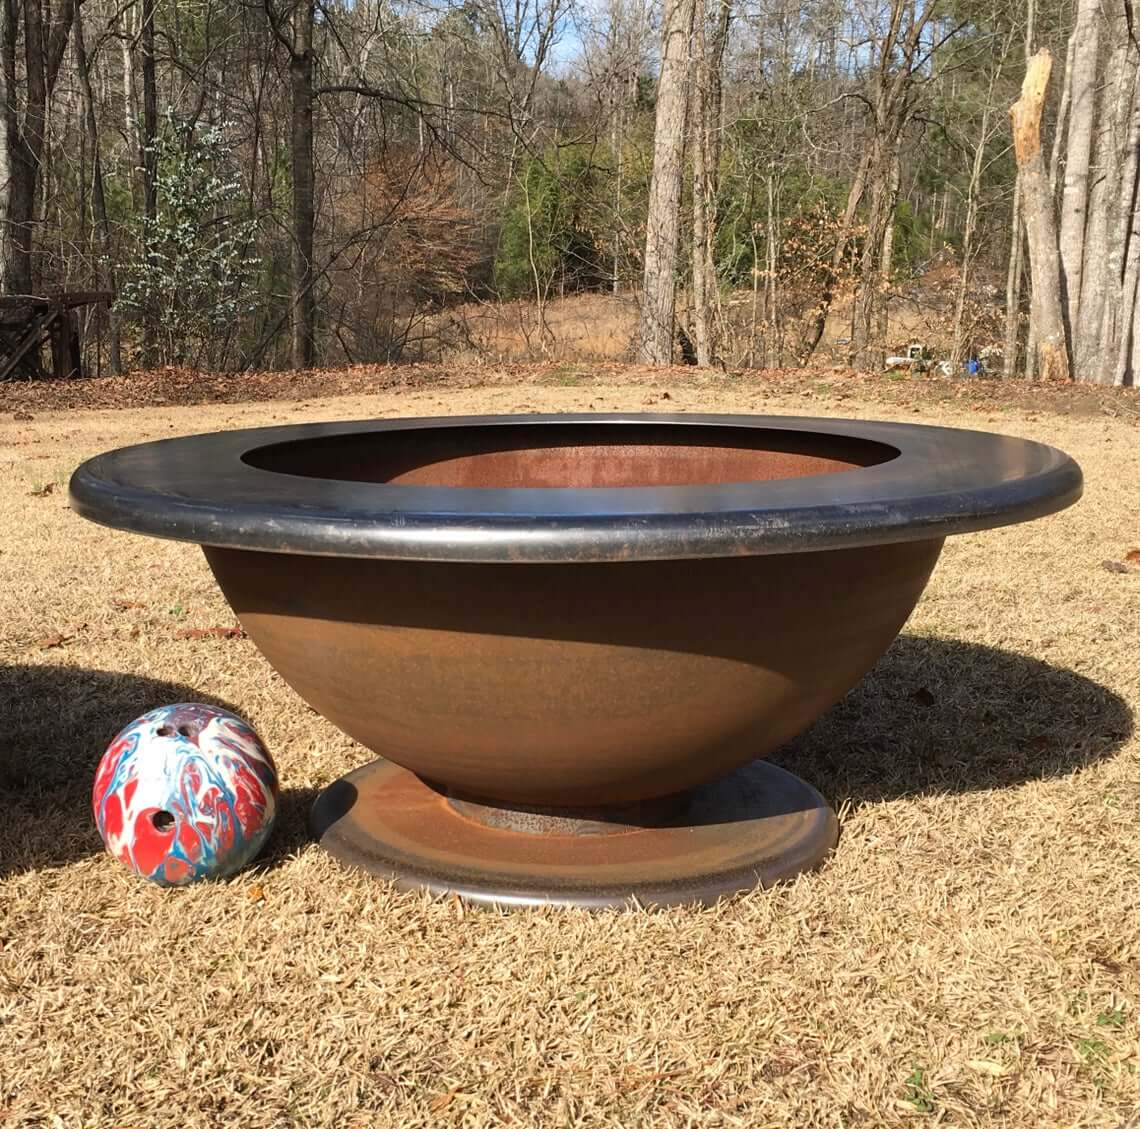 Table Top Rim Fire Pit